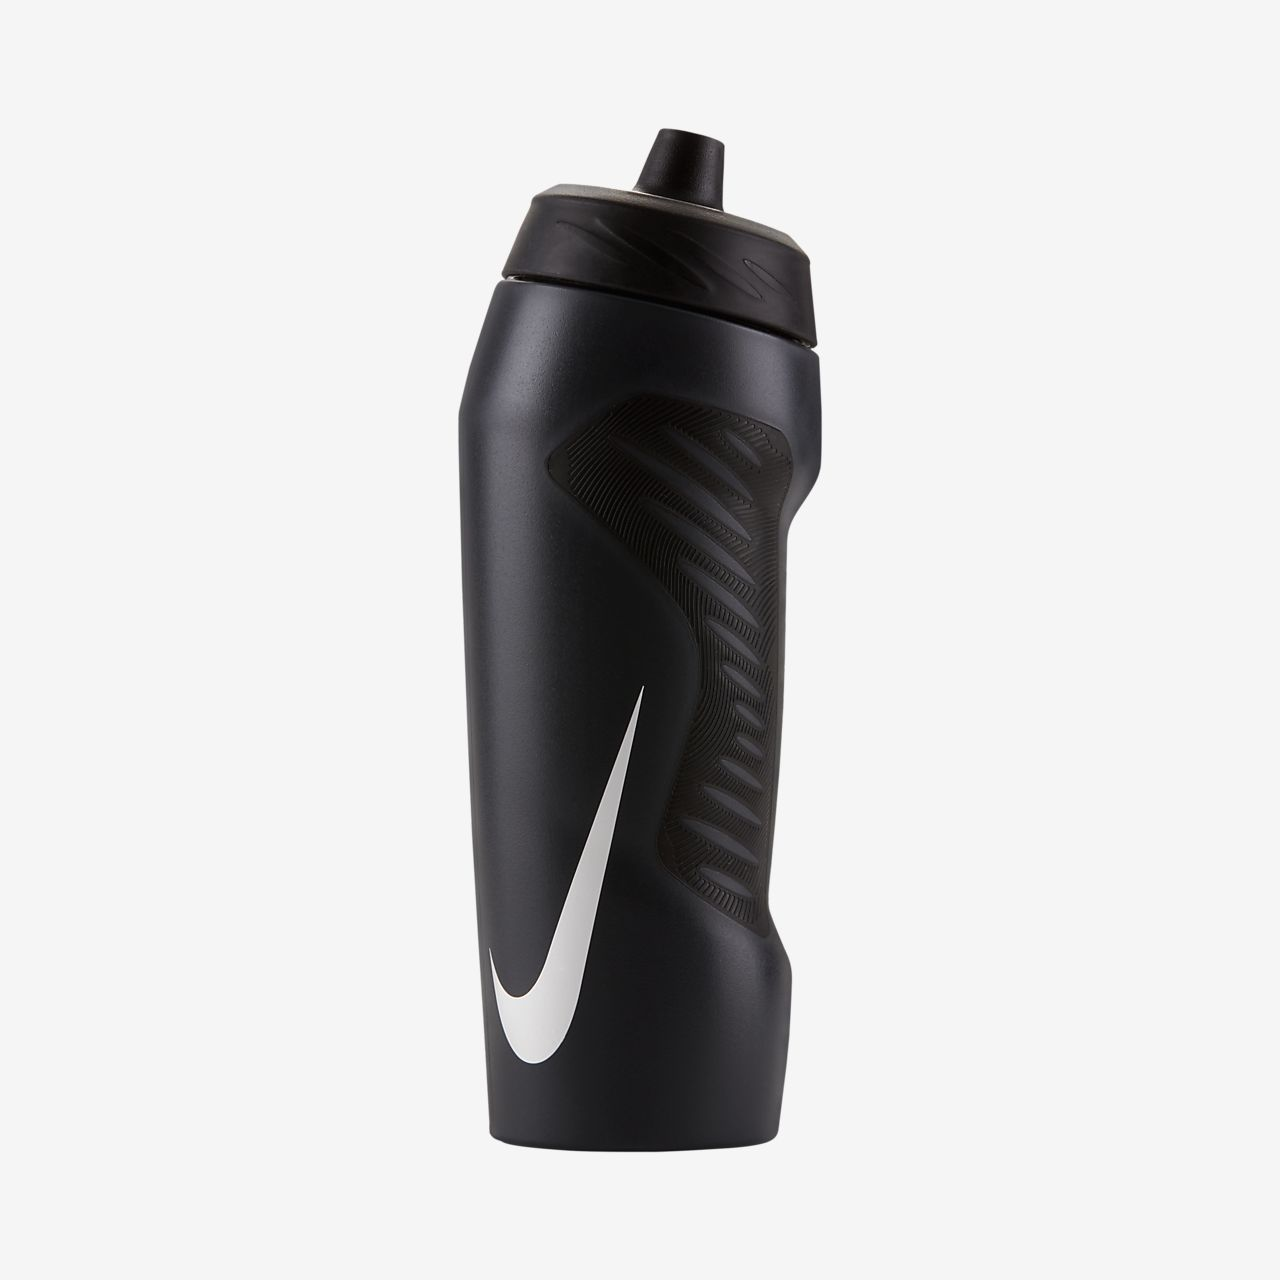 Nike HyperFuel Wasserflasche (710 ml)